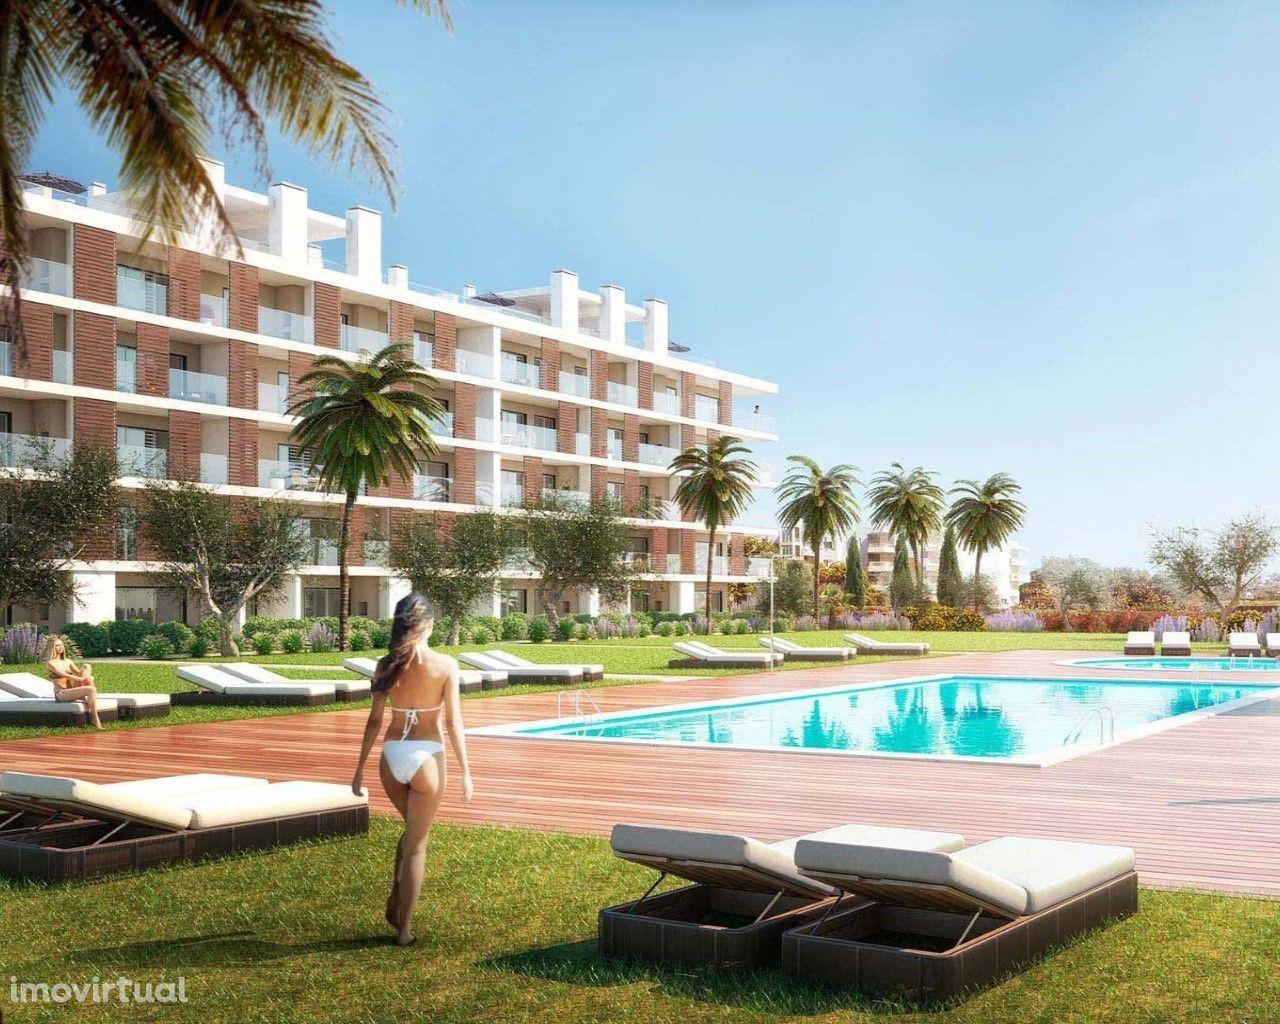 Albufeira Green Apartments - Condominio privado